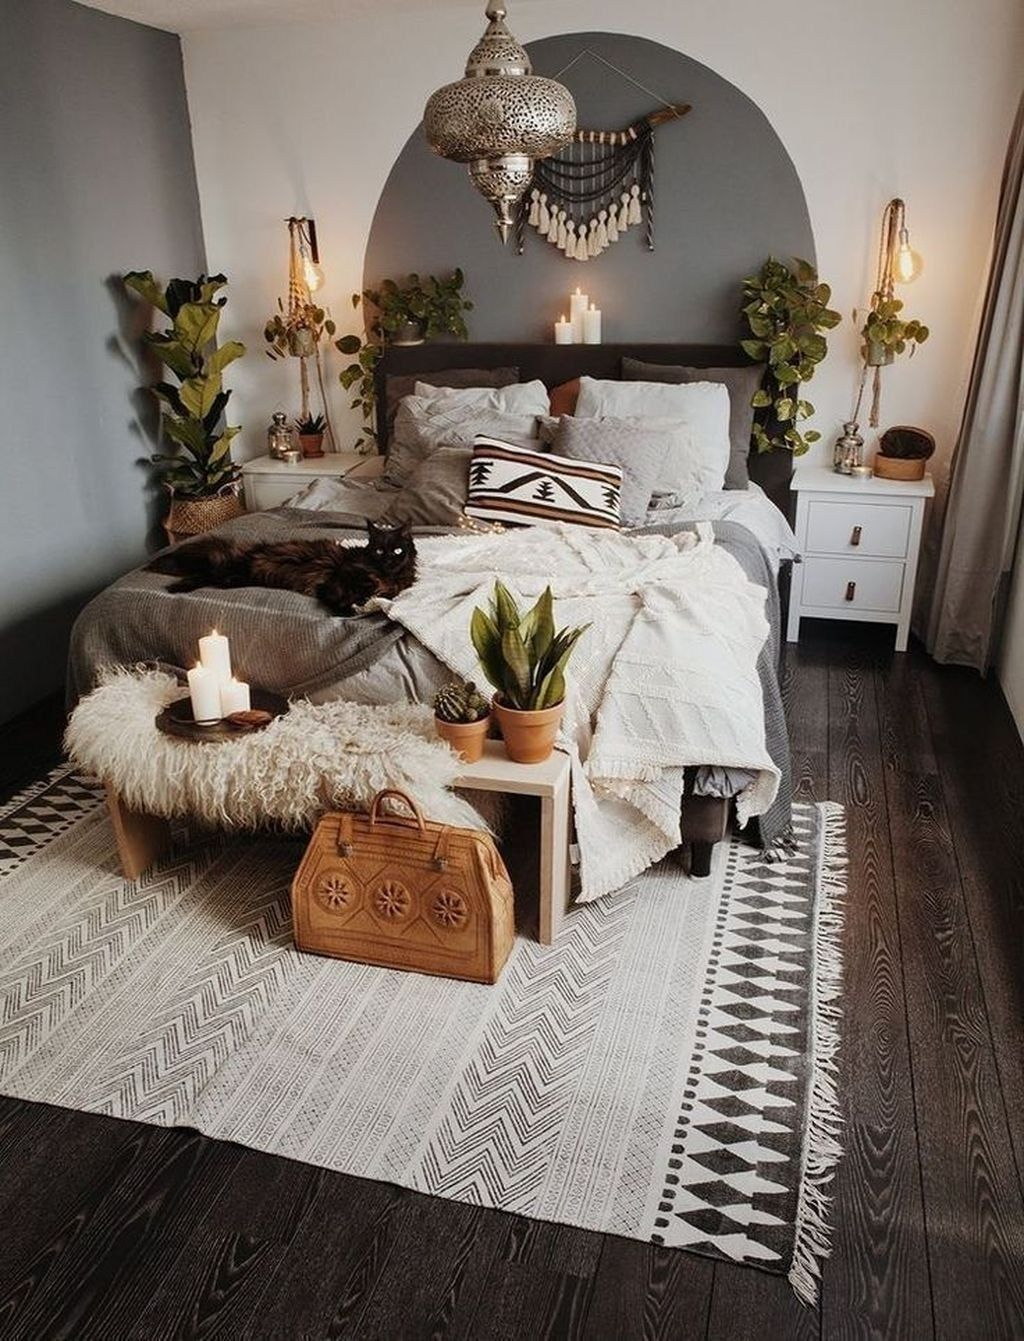 Amazing Boho Living Room Décor Ideas On A Budget 47 | Home ... on Bohemian Bedroom Ideas On A Budget  id=56809